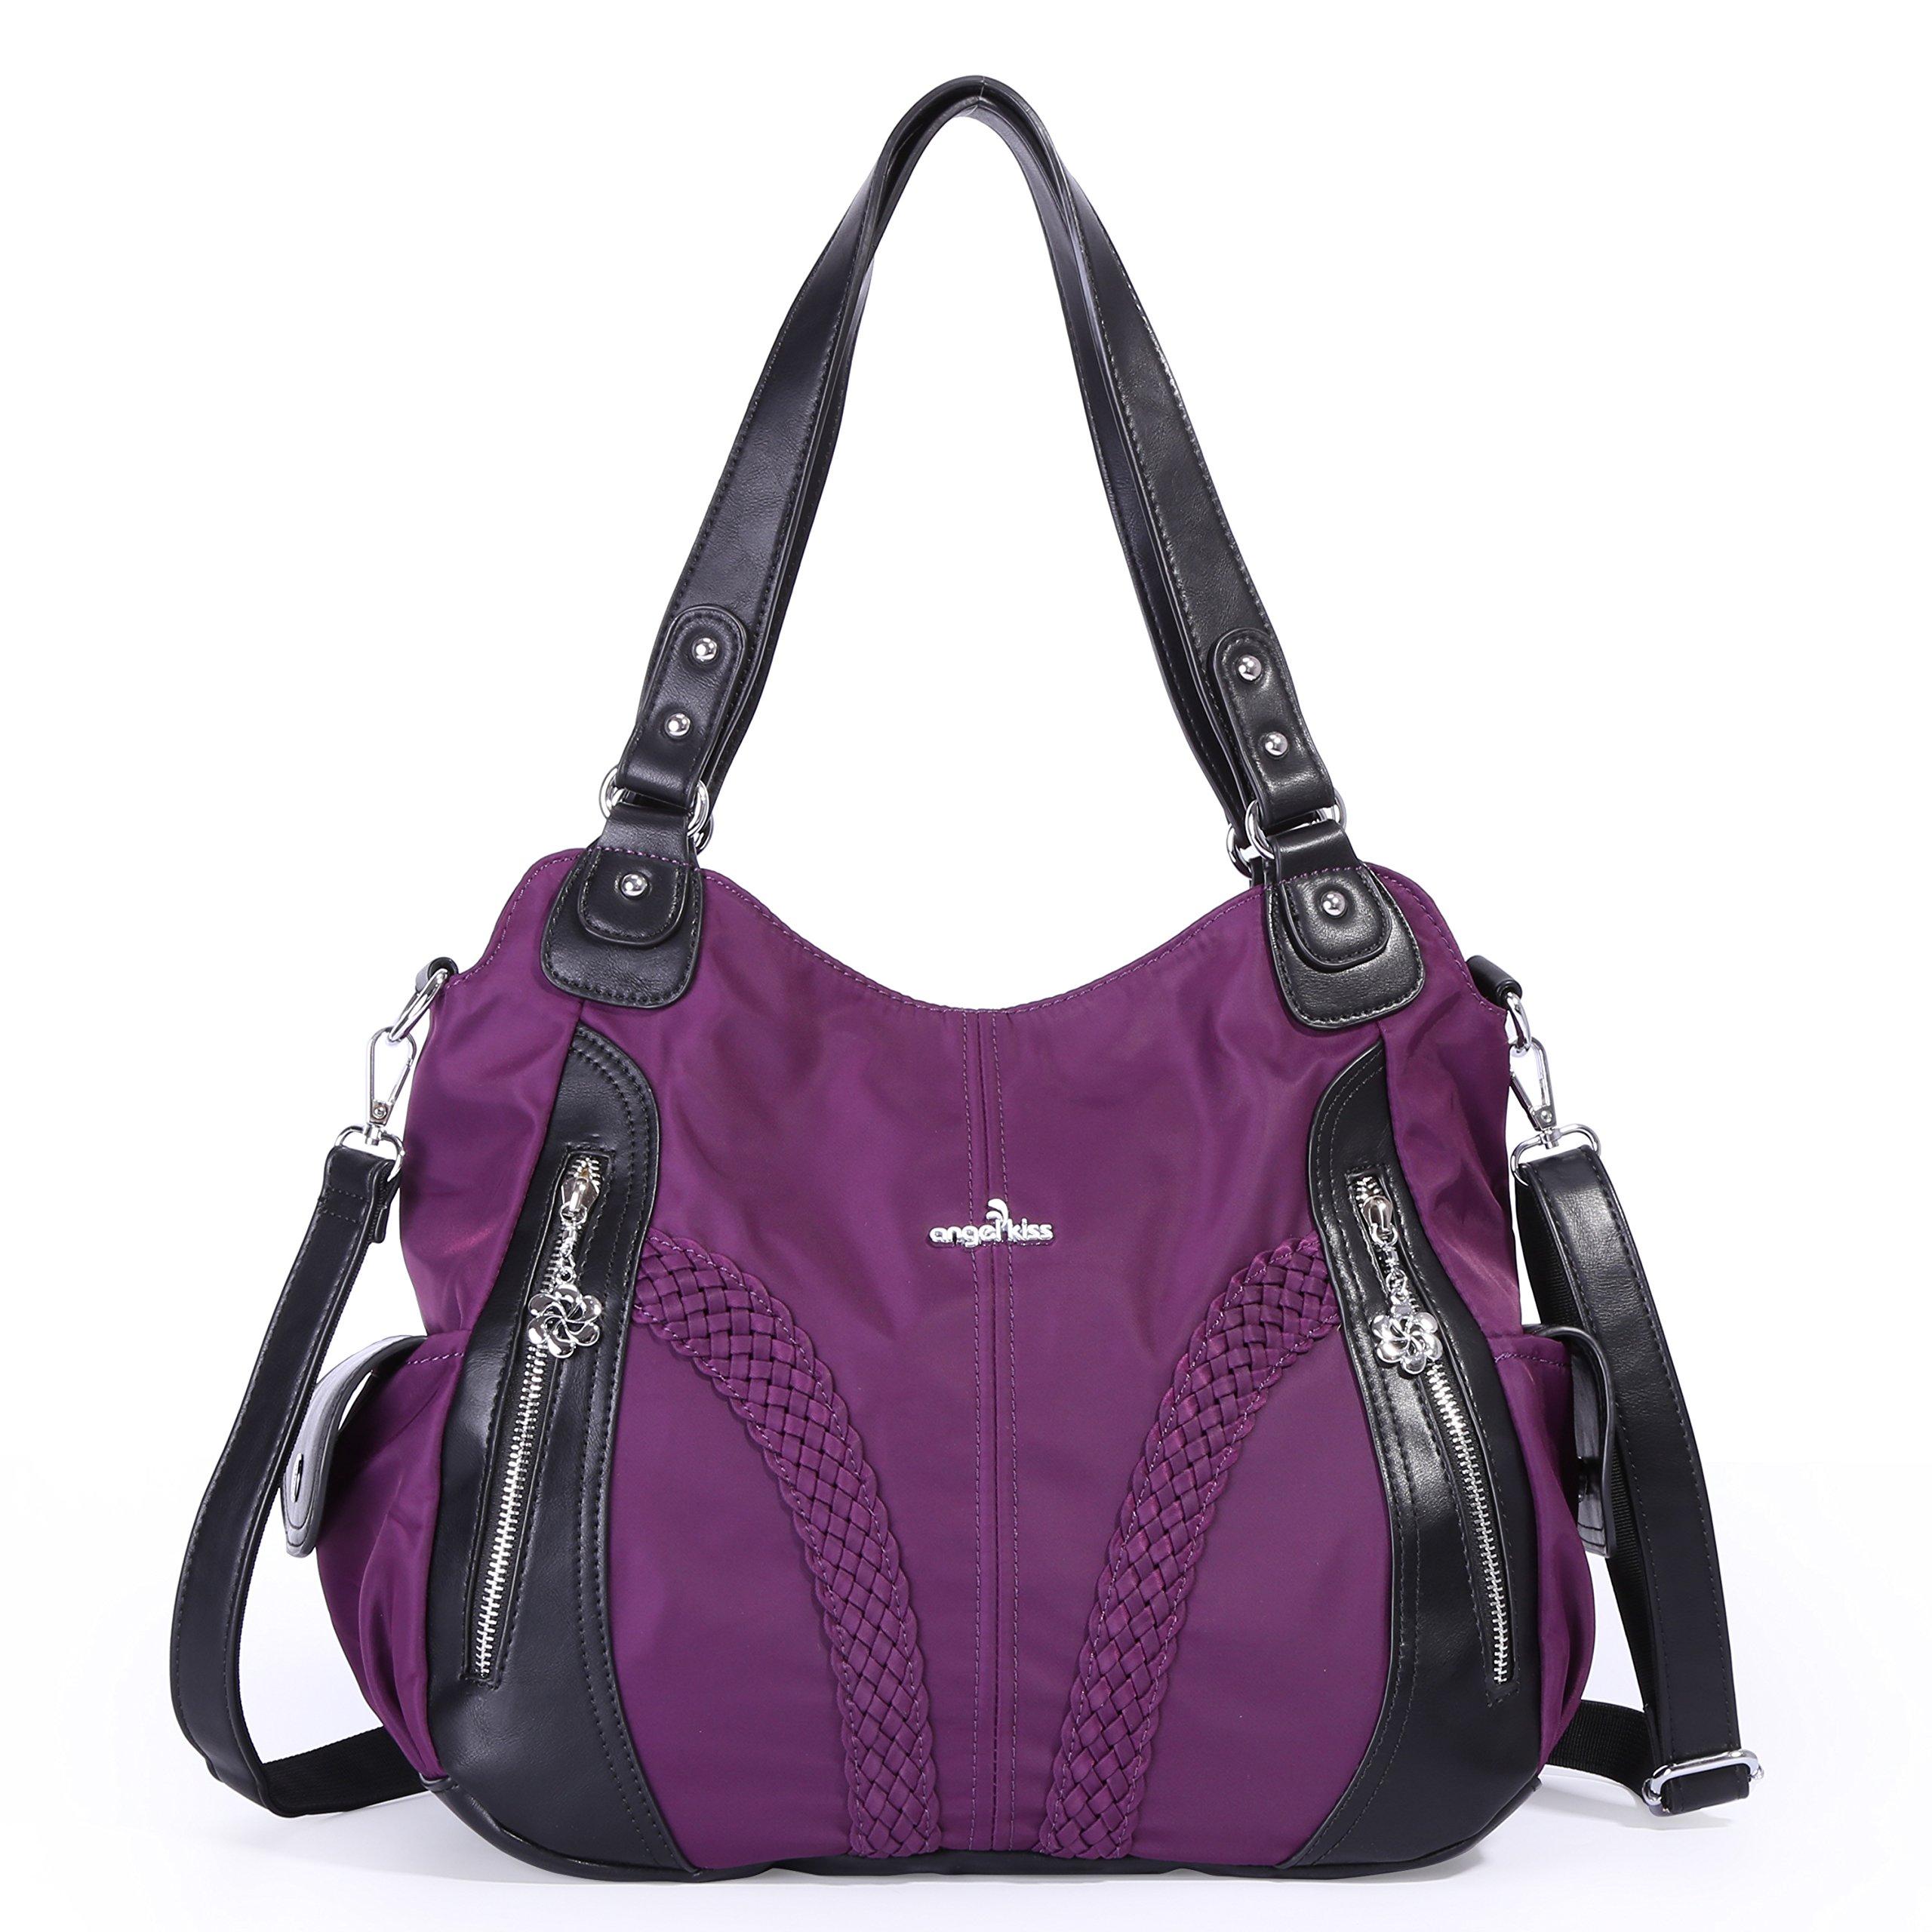 Angelkiss Women Top Handle Satchel Handbags Shoulder Bag Messenger Tote Nylon Material Purses Bag (Purple-1) by Angel Kiss